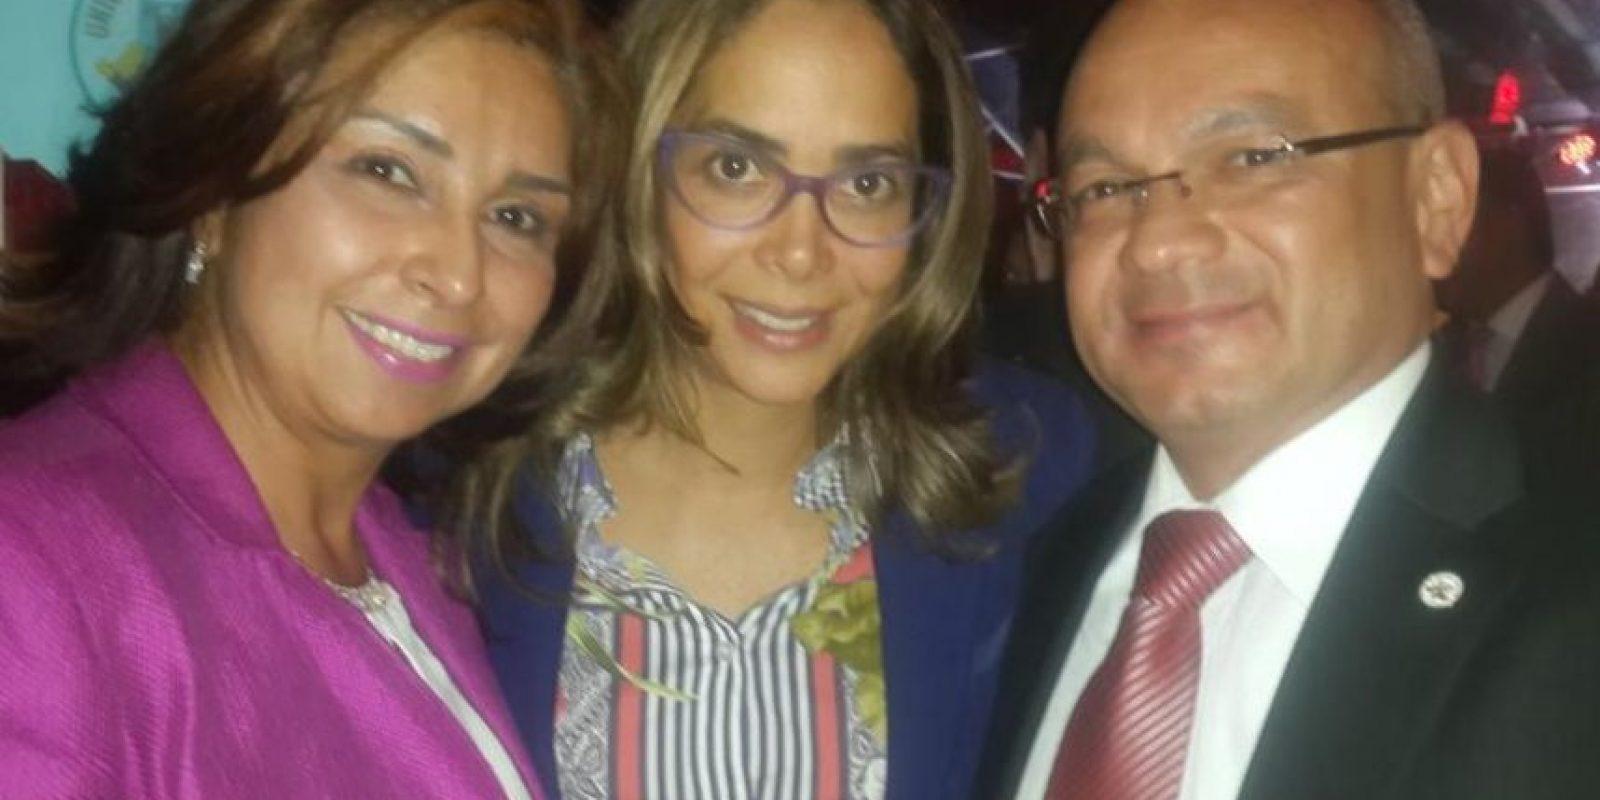 Vicepresidenta del Senado, Nidia Marcela Osorio. Foto:Twitter Nidia Marcela Osorio